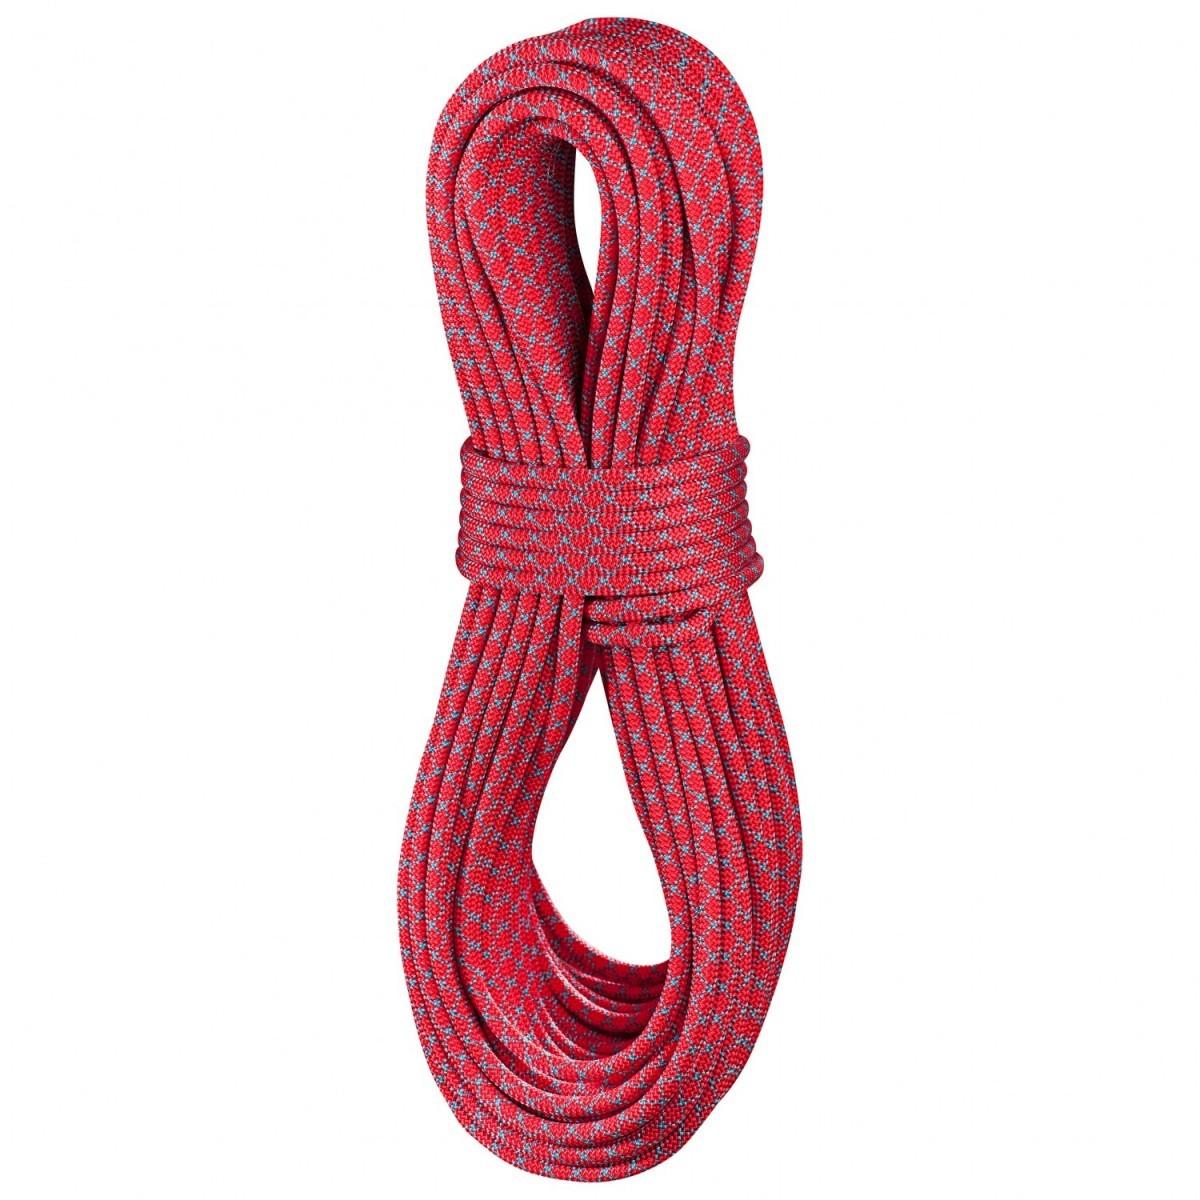 EDELRID エーデルリッド Swift 8.9mm (Red) 60m★ロープ・ザイル・登山・クライミング★